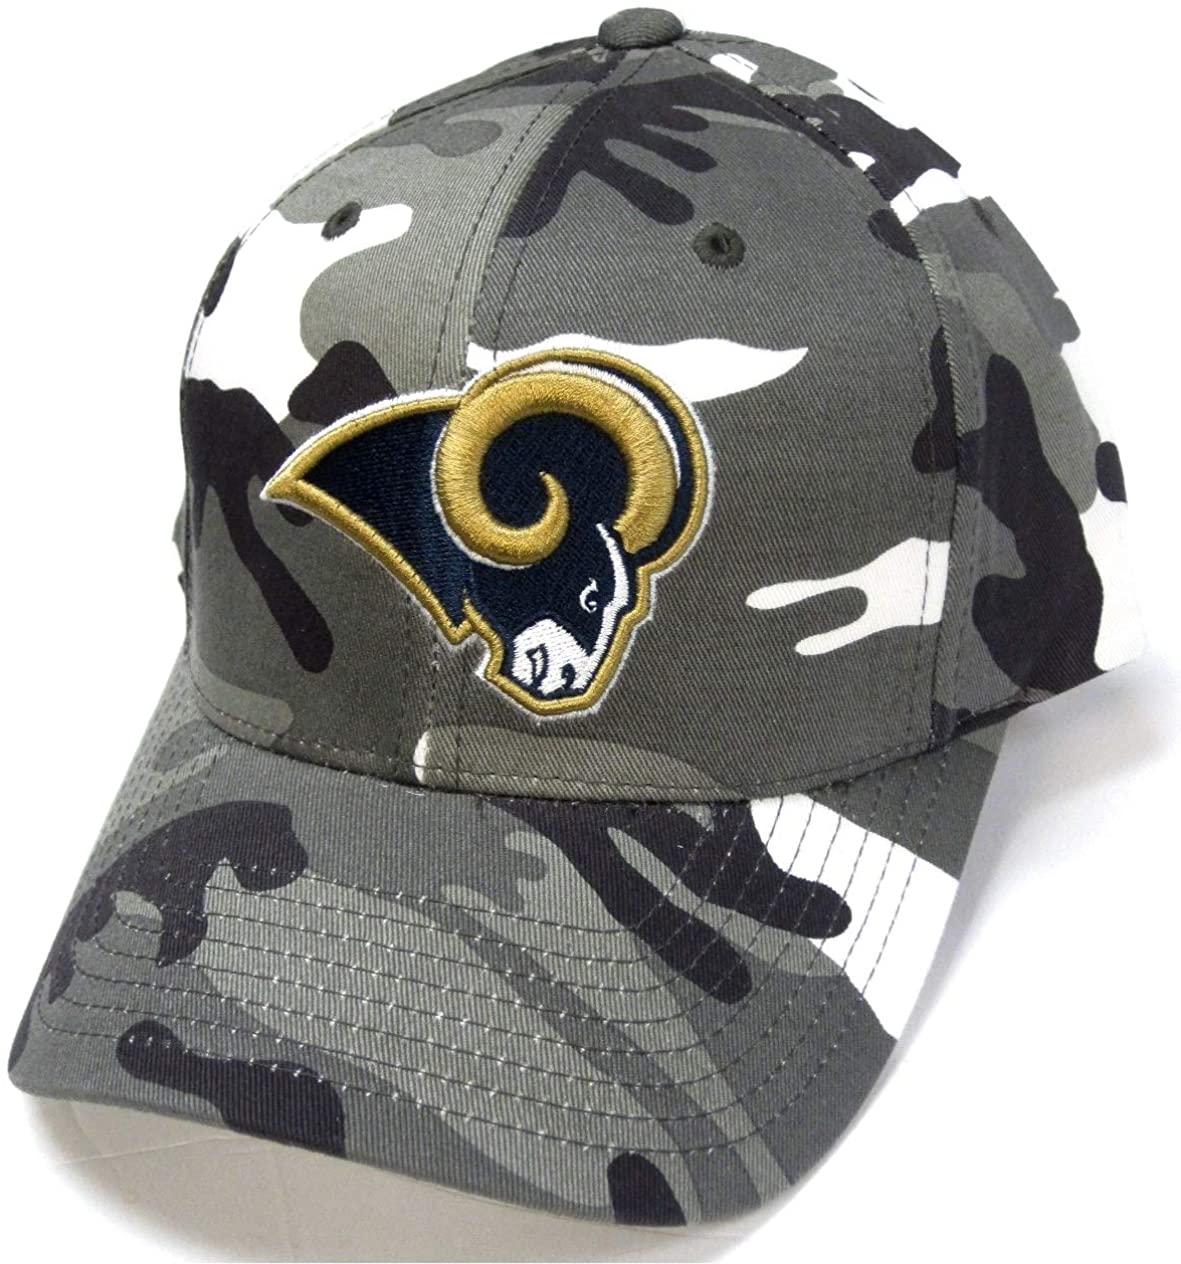 LA Rams Team Apparel Gray White Woodland Camo Hat Cap Adult Men's Adjustable